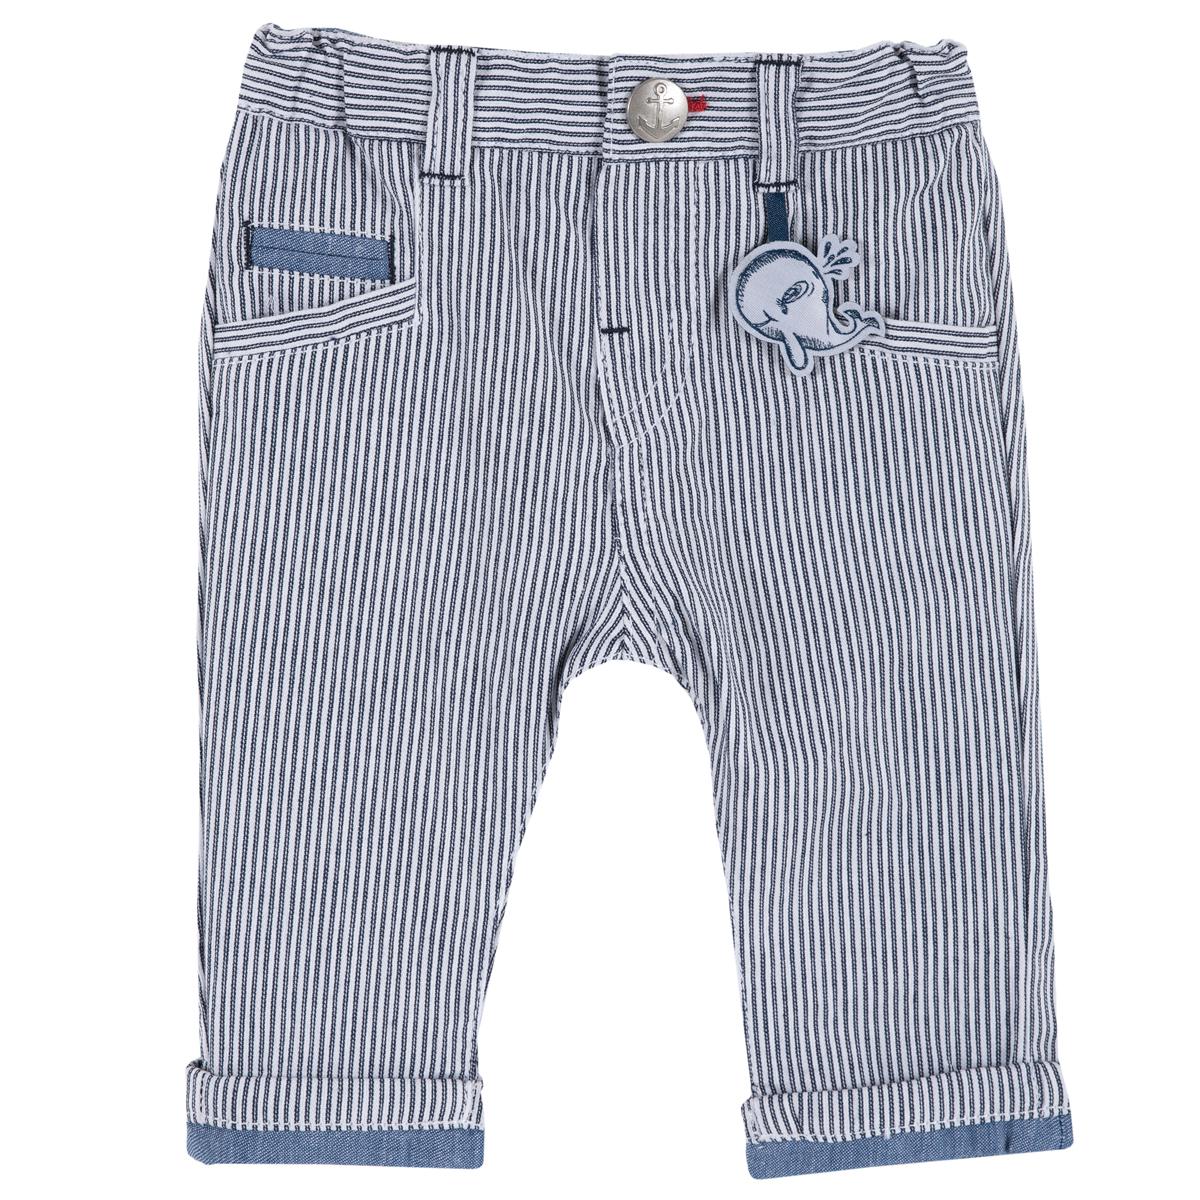 Pantalon lung copii Chicco, mansete si breloc, 24970